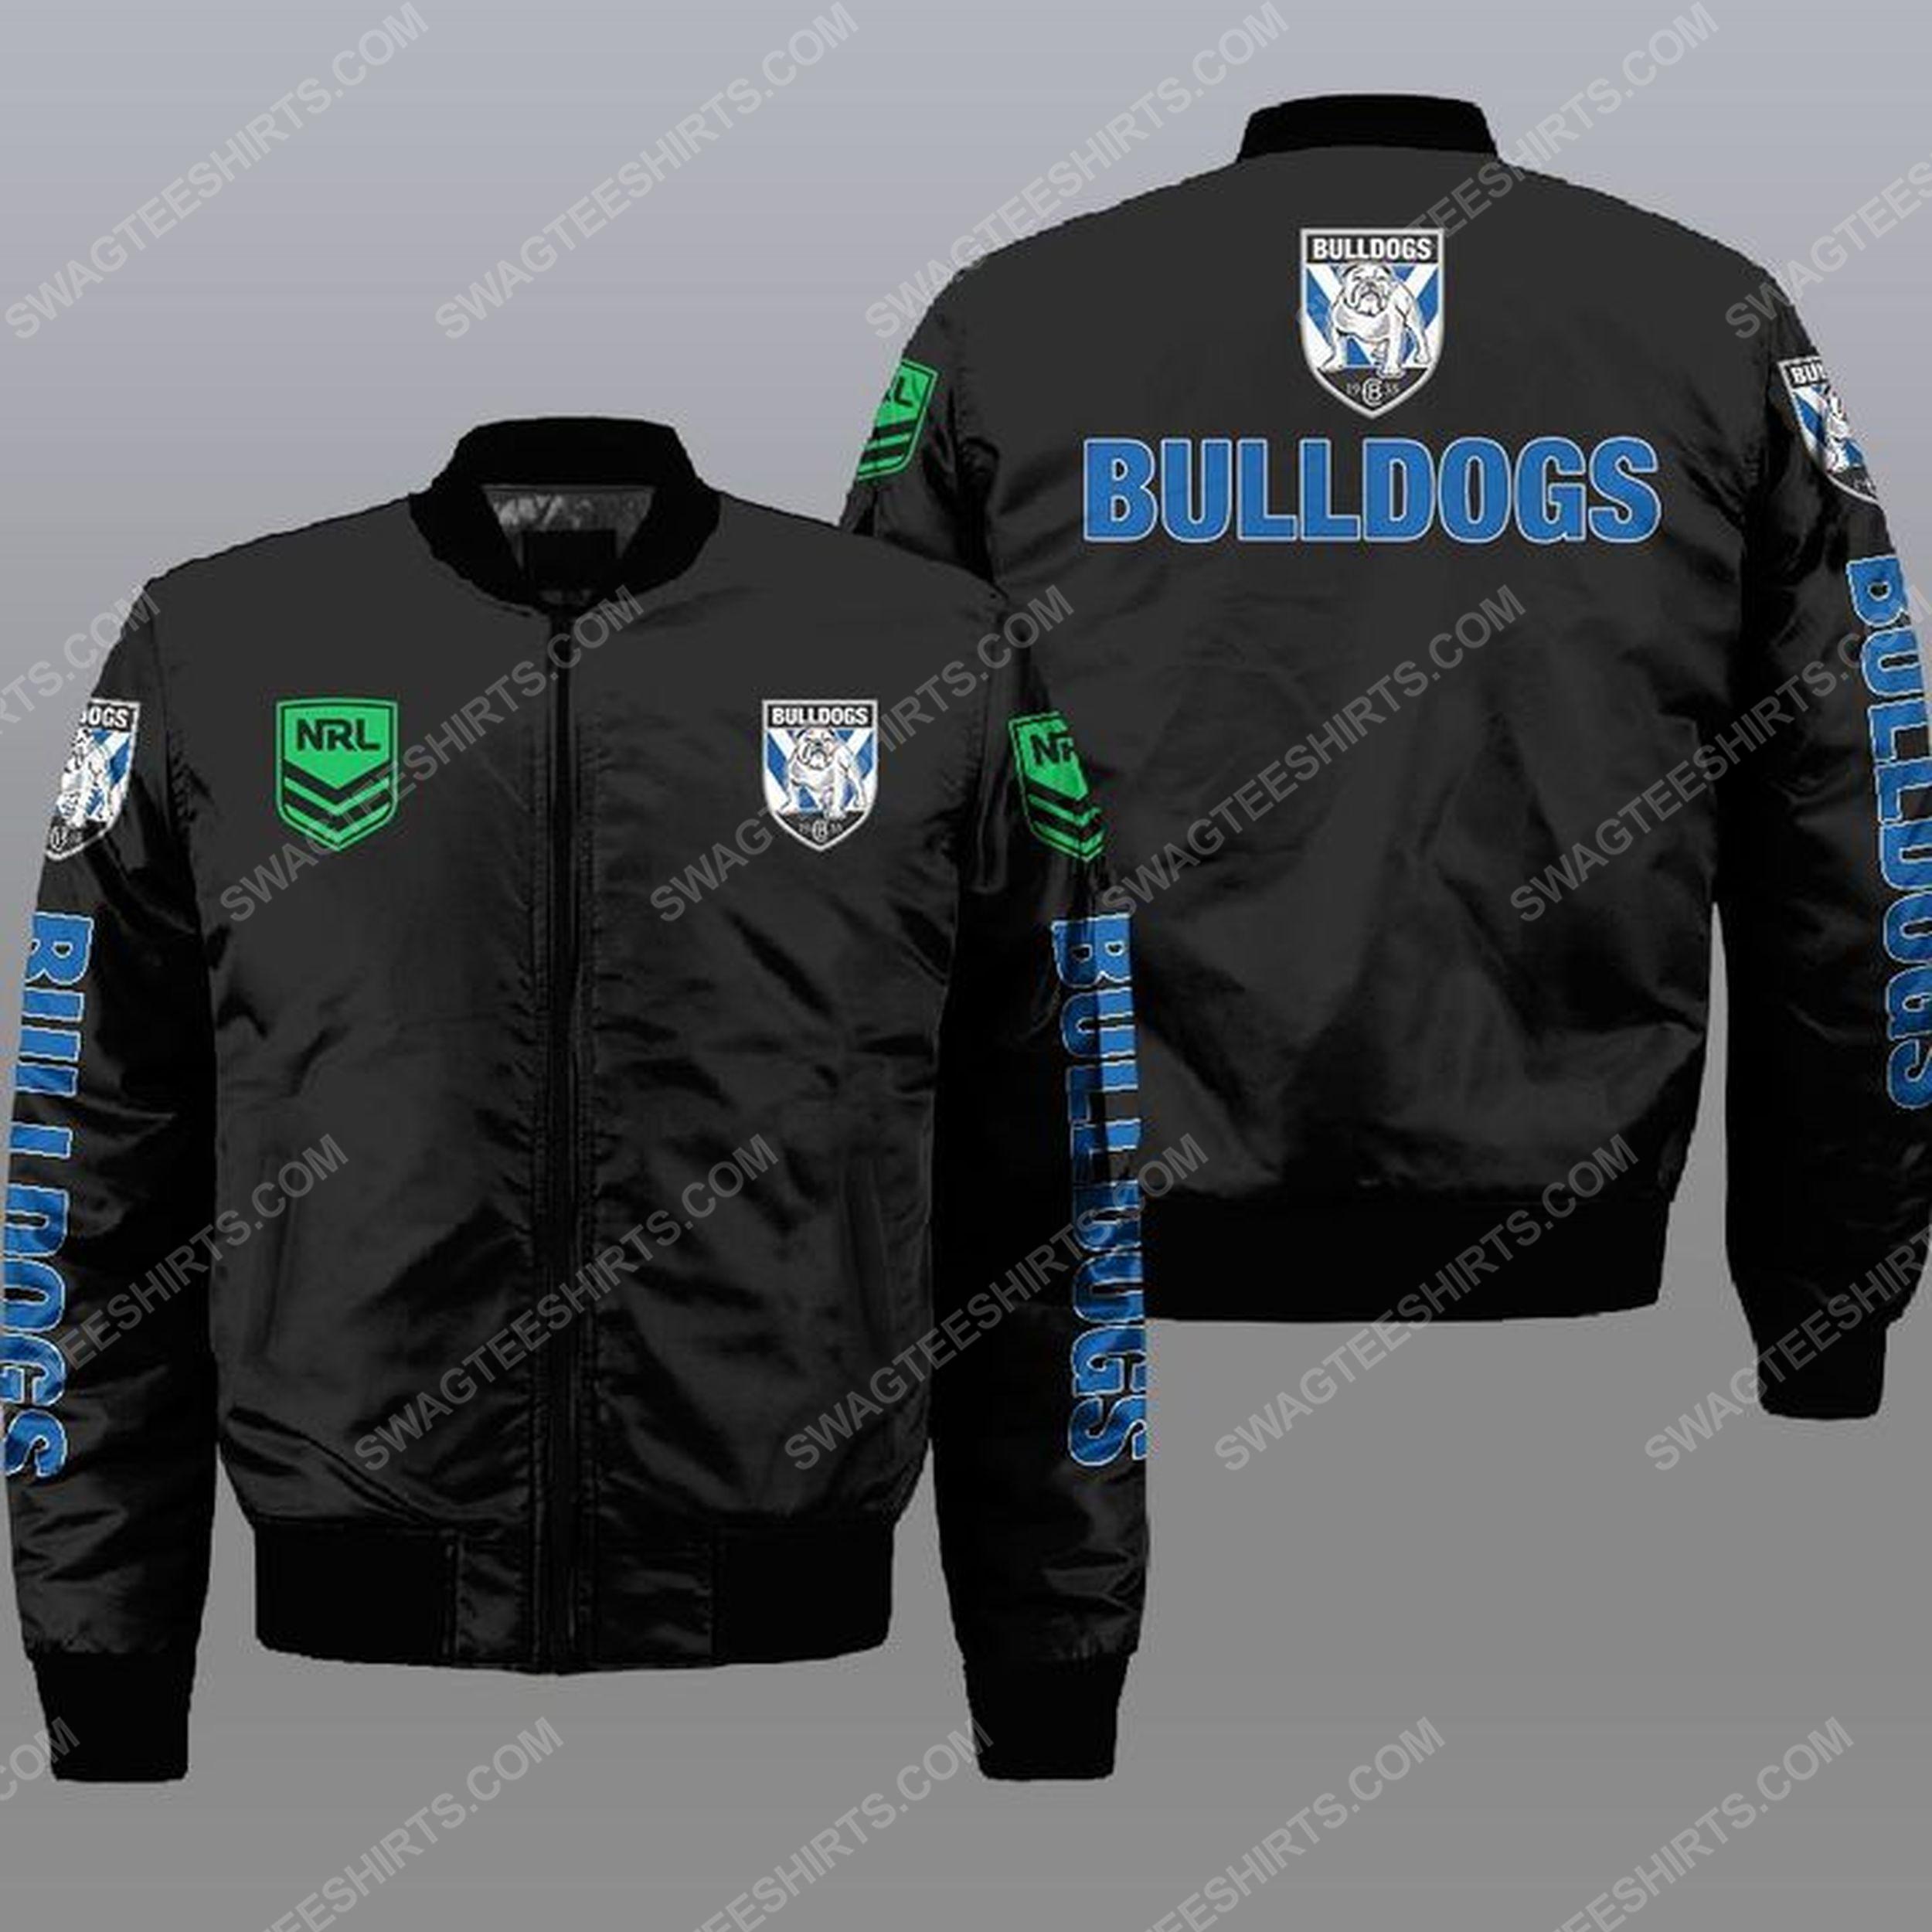 Canterbury-bankstown bulldogs all over print bomber jacket - black 1